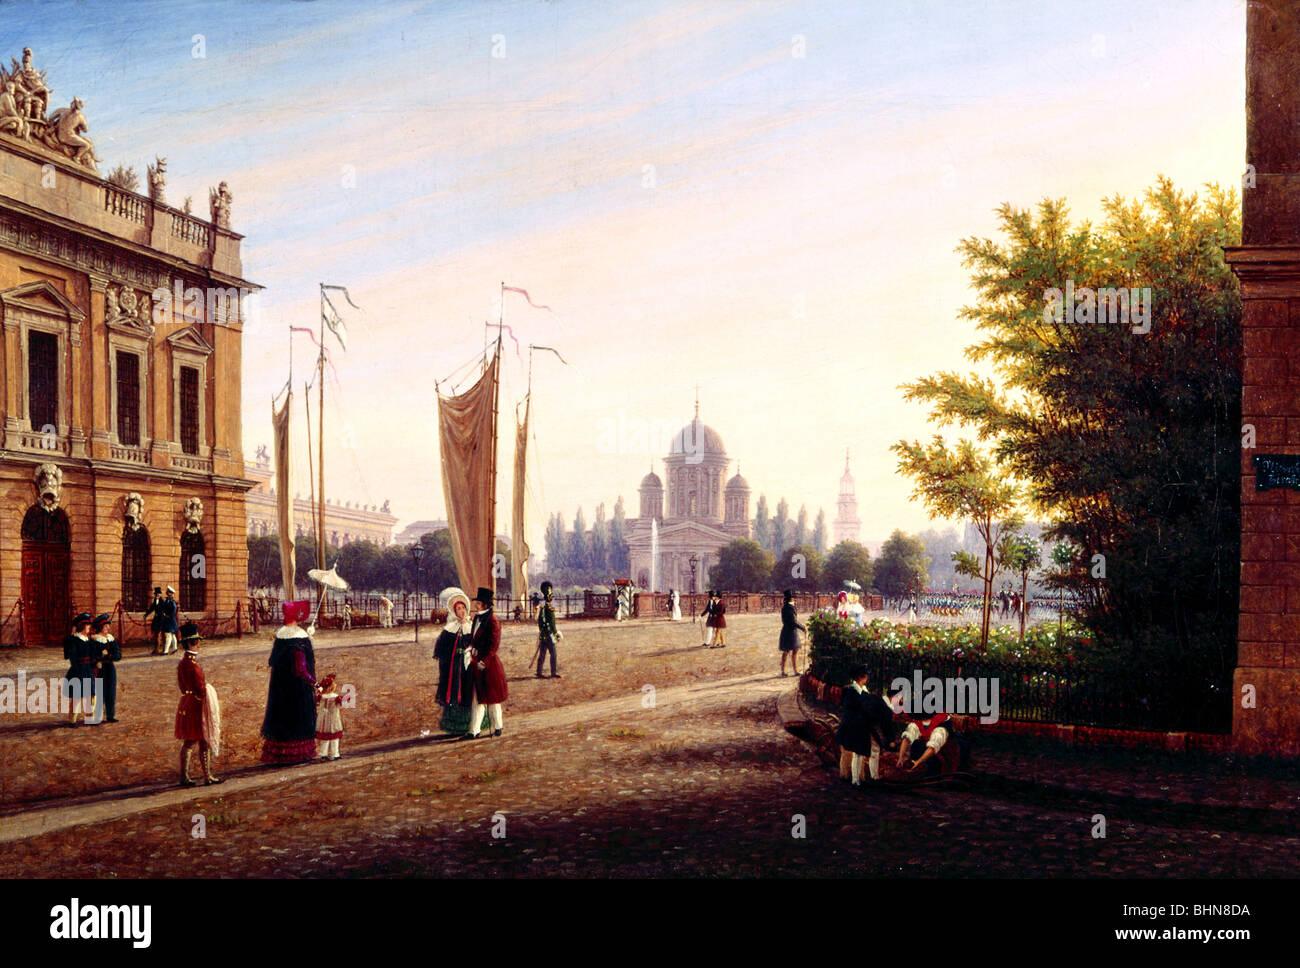 Geografía / viajes, Alemania, Berlín, puente Schlossbruecke, pintura 'Berliner Dom Schlossbruecke Imagen De Stock